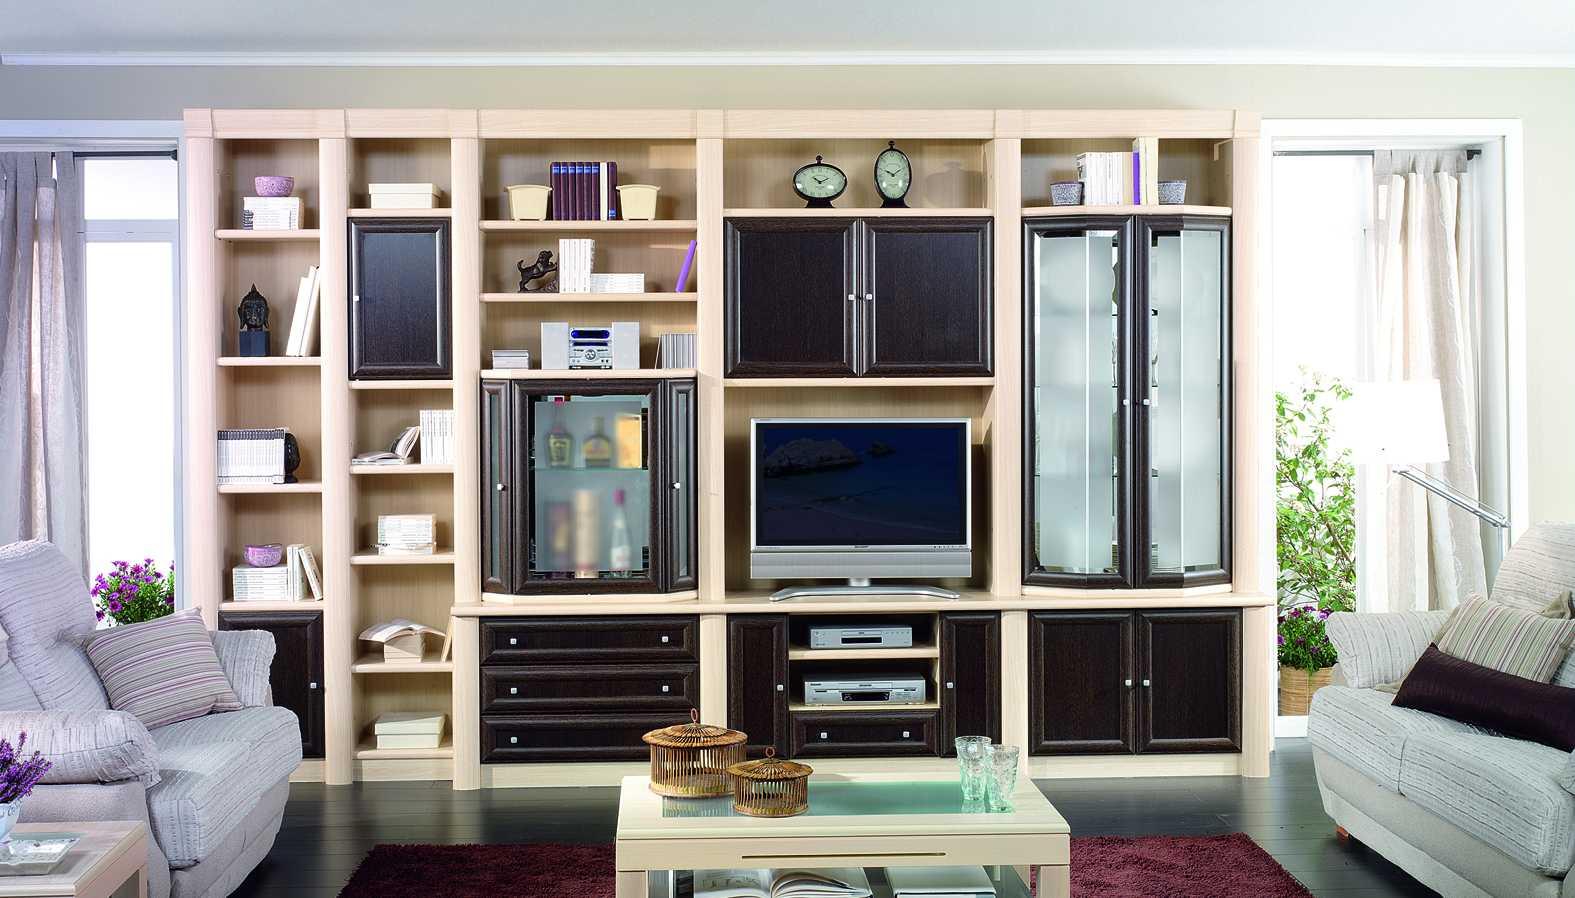 Semimural 16 muebles san miguel for Librerias clasicas para salon